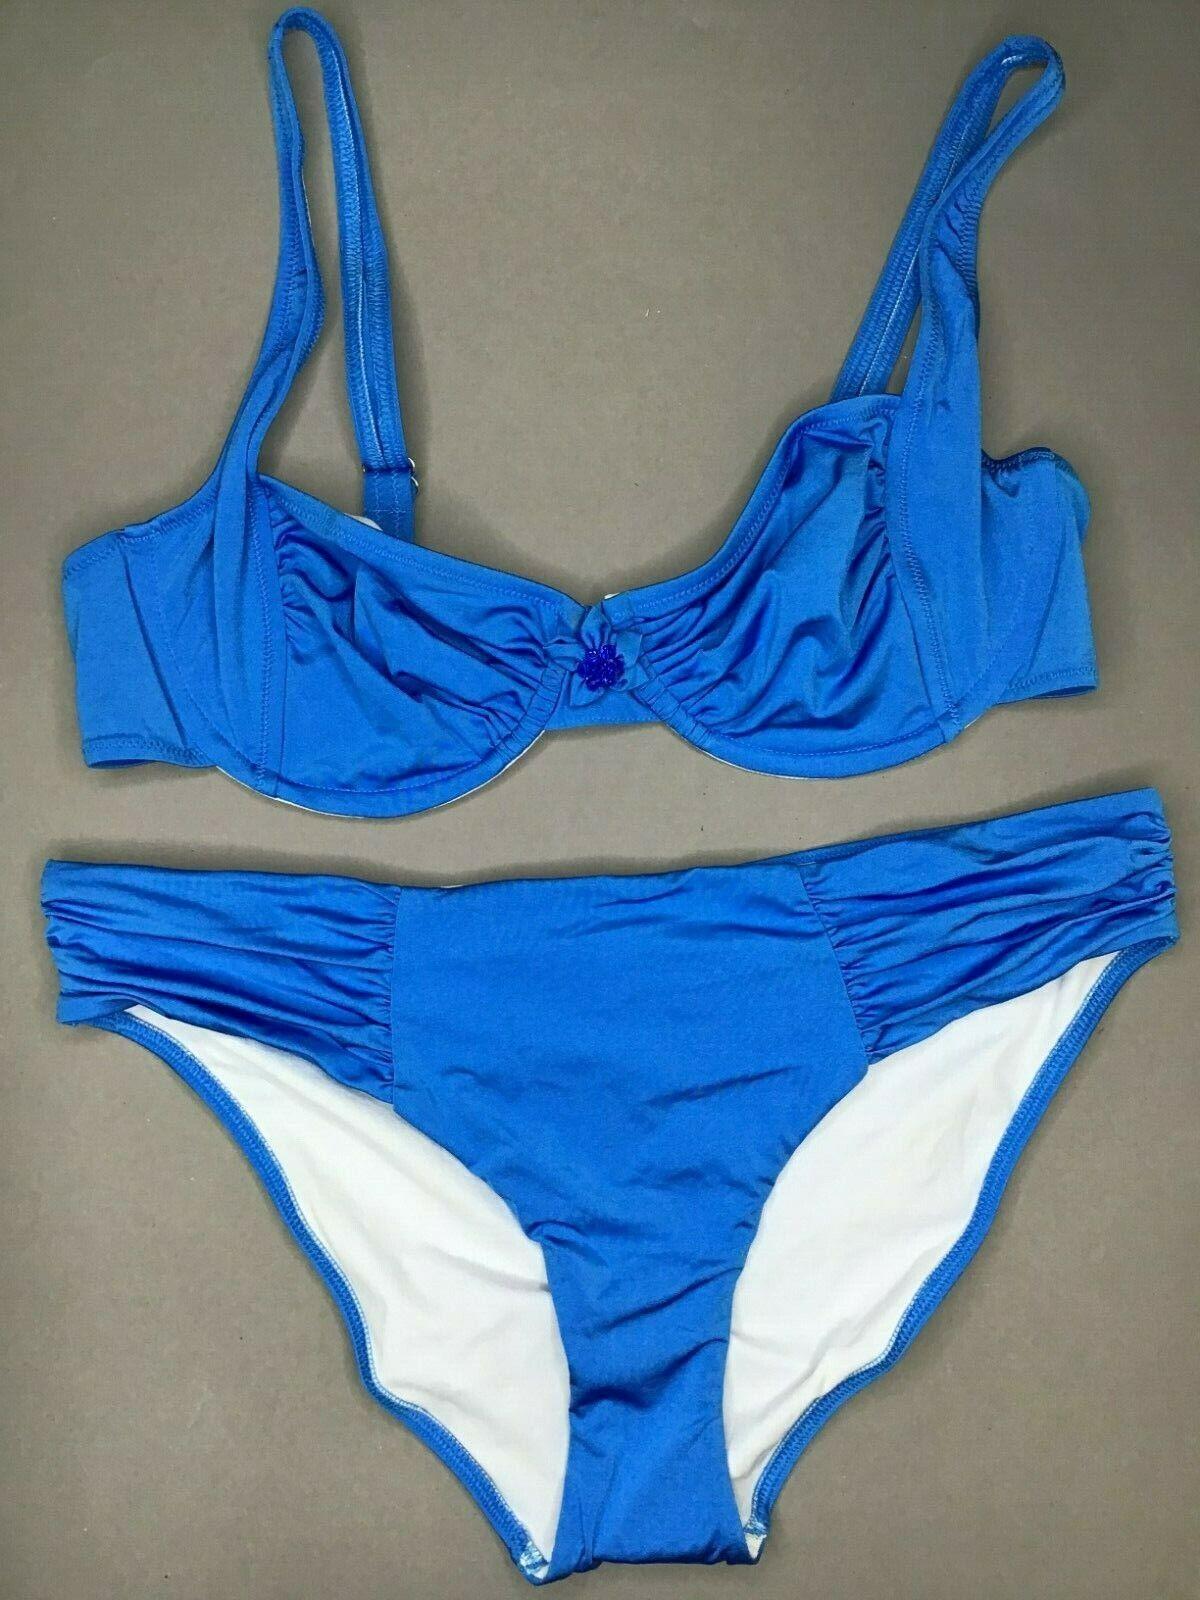 Jolidon Womens Bikini Set F2135 ungepolstert Underwired Blue NEW